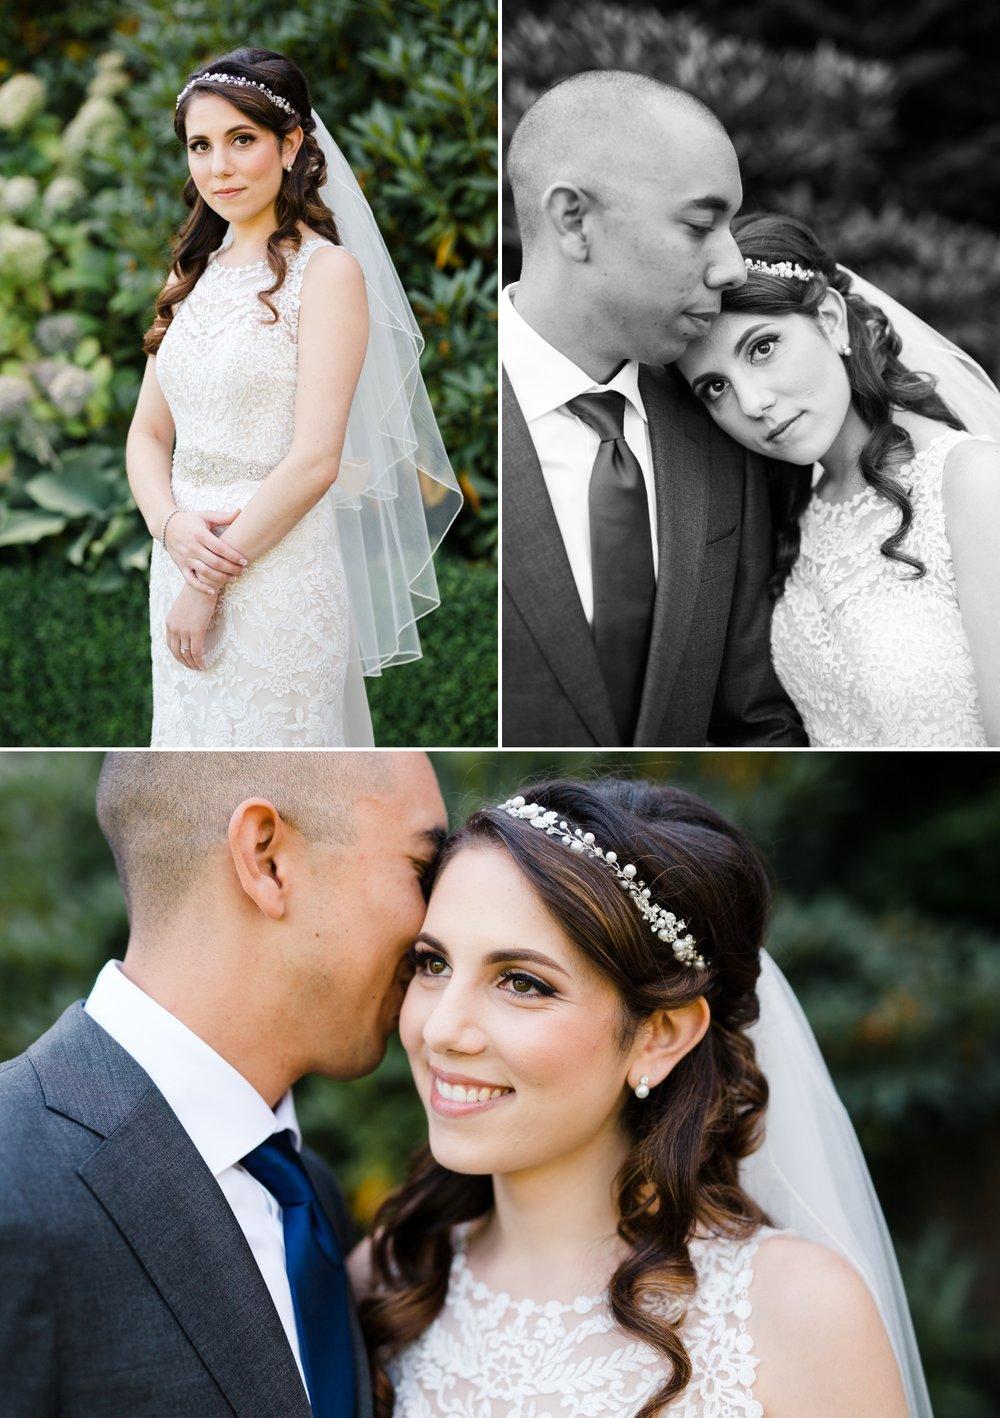 22-wedding-couple-portraits-newcastle-golf-club.jpg